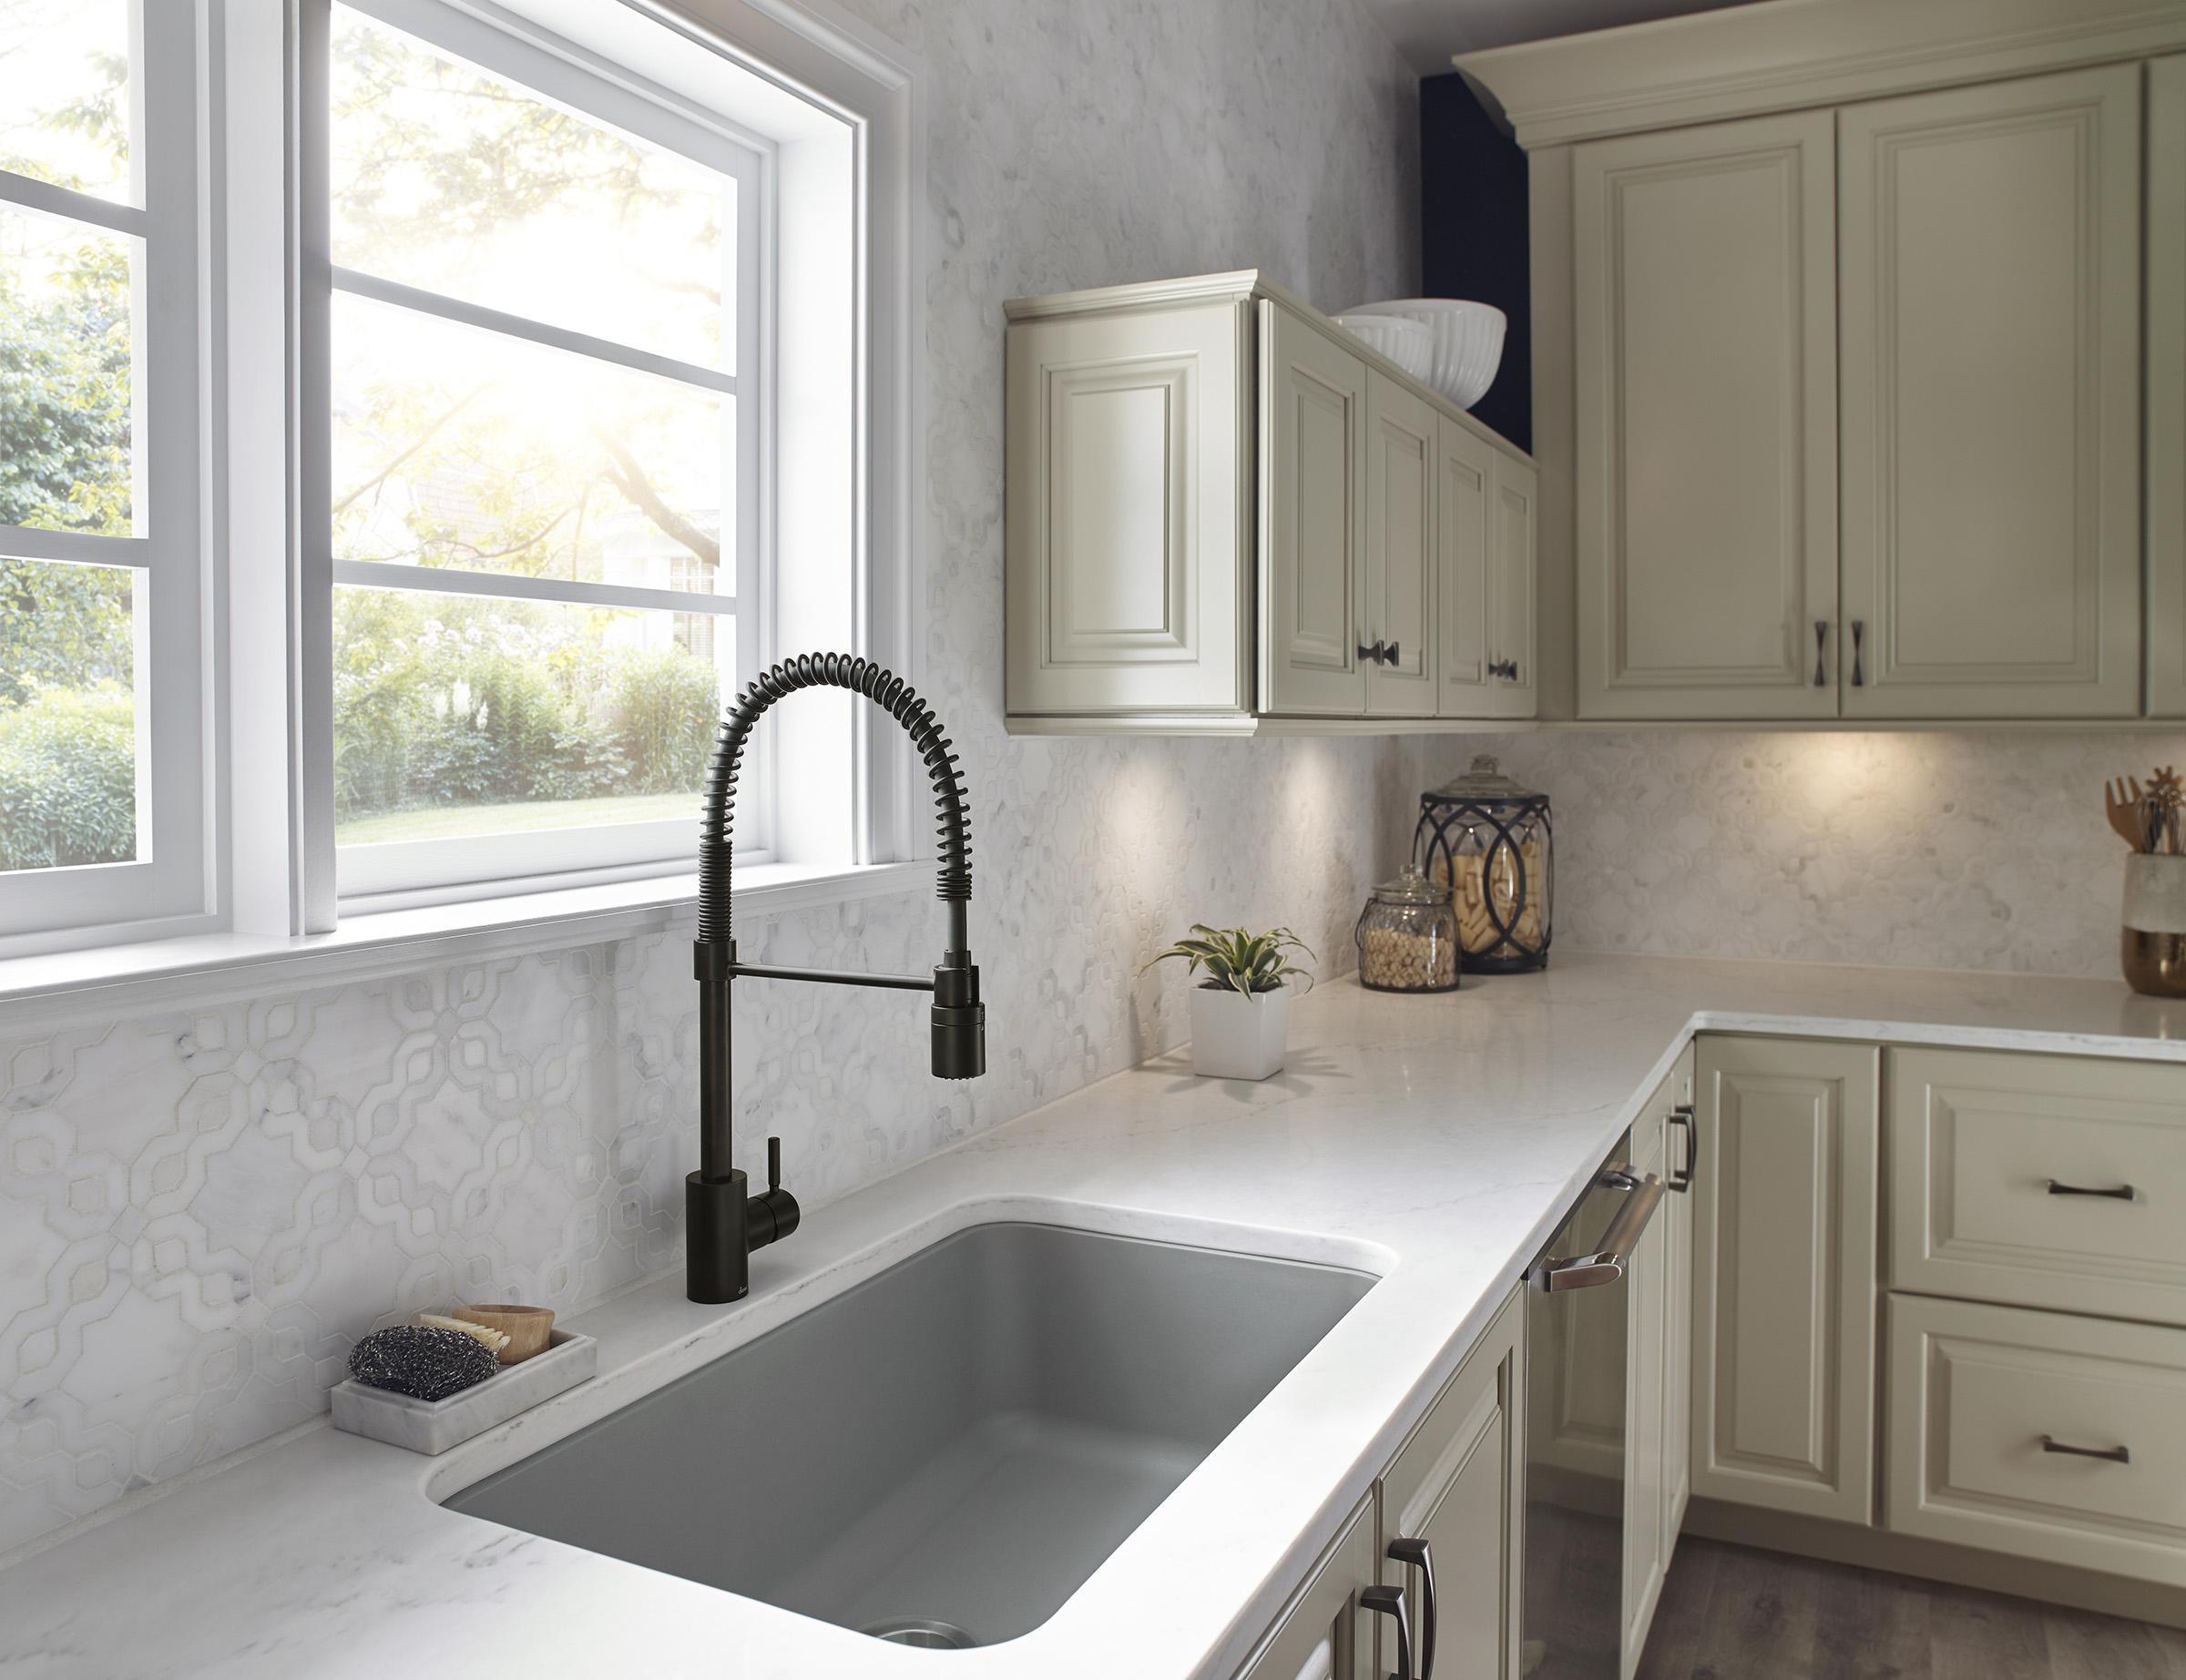 Foo Kitchen Faucet